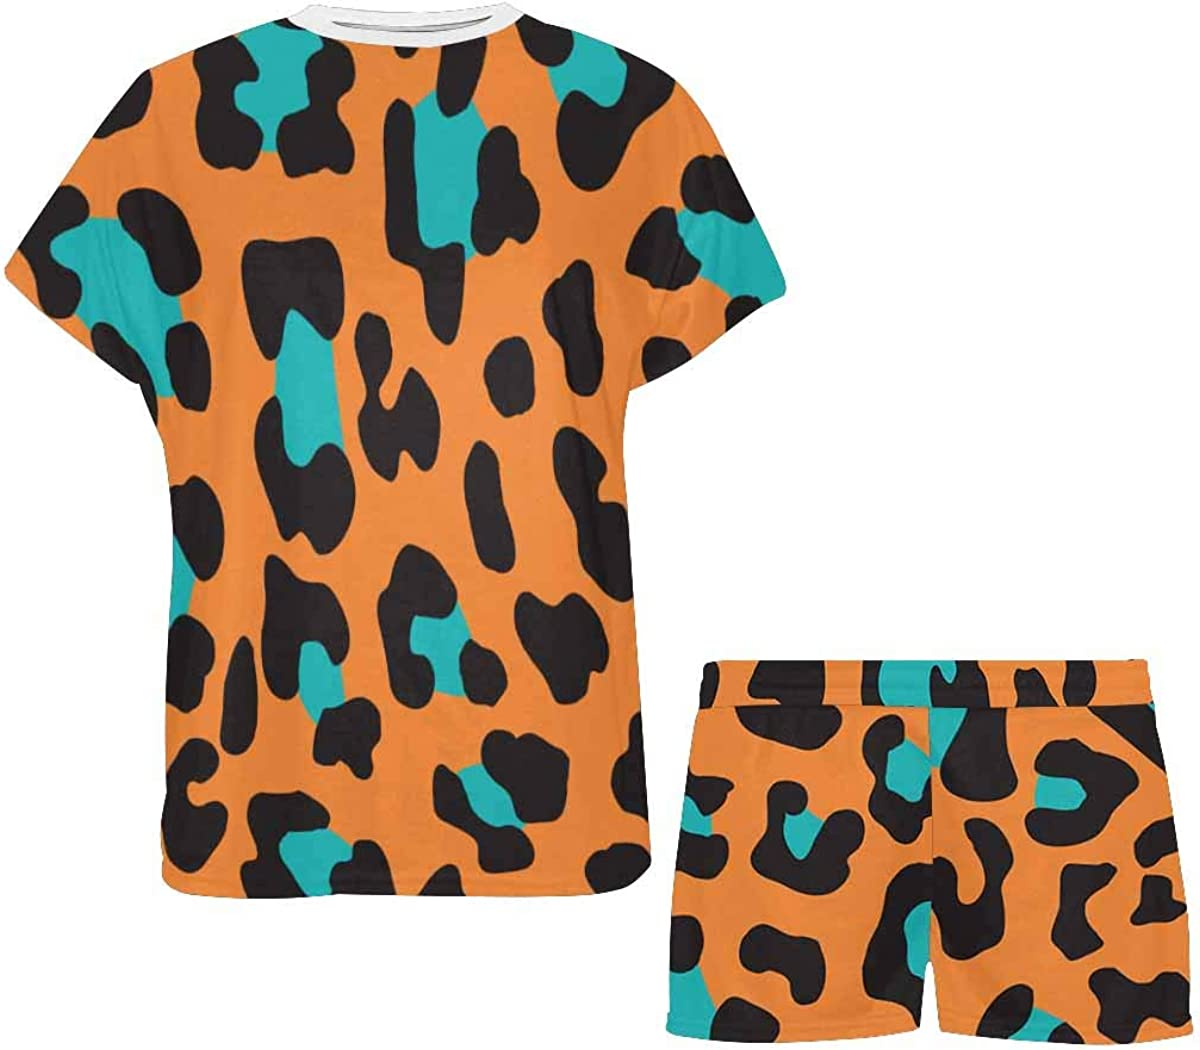 InterestPrint Wild Animal Leopard Print Women's Pajama Sets Short Sleeve Shorts - Pajamas for Women